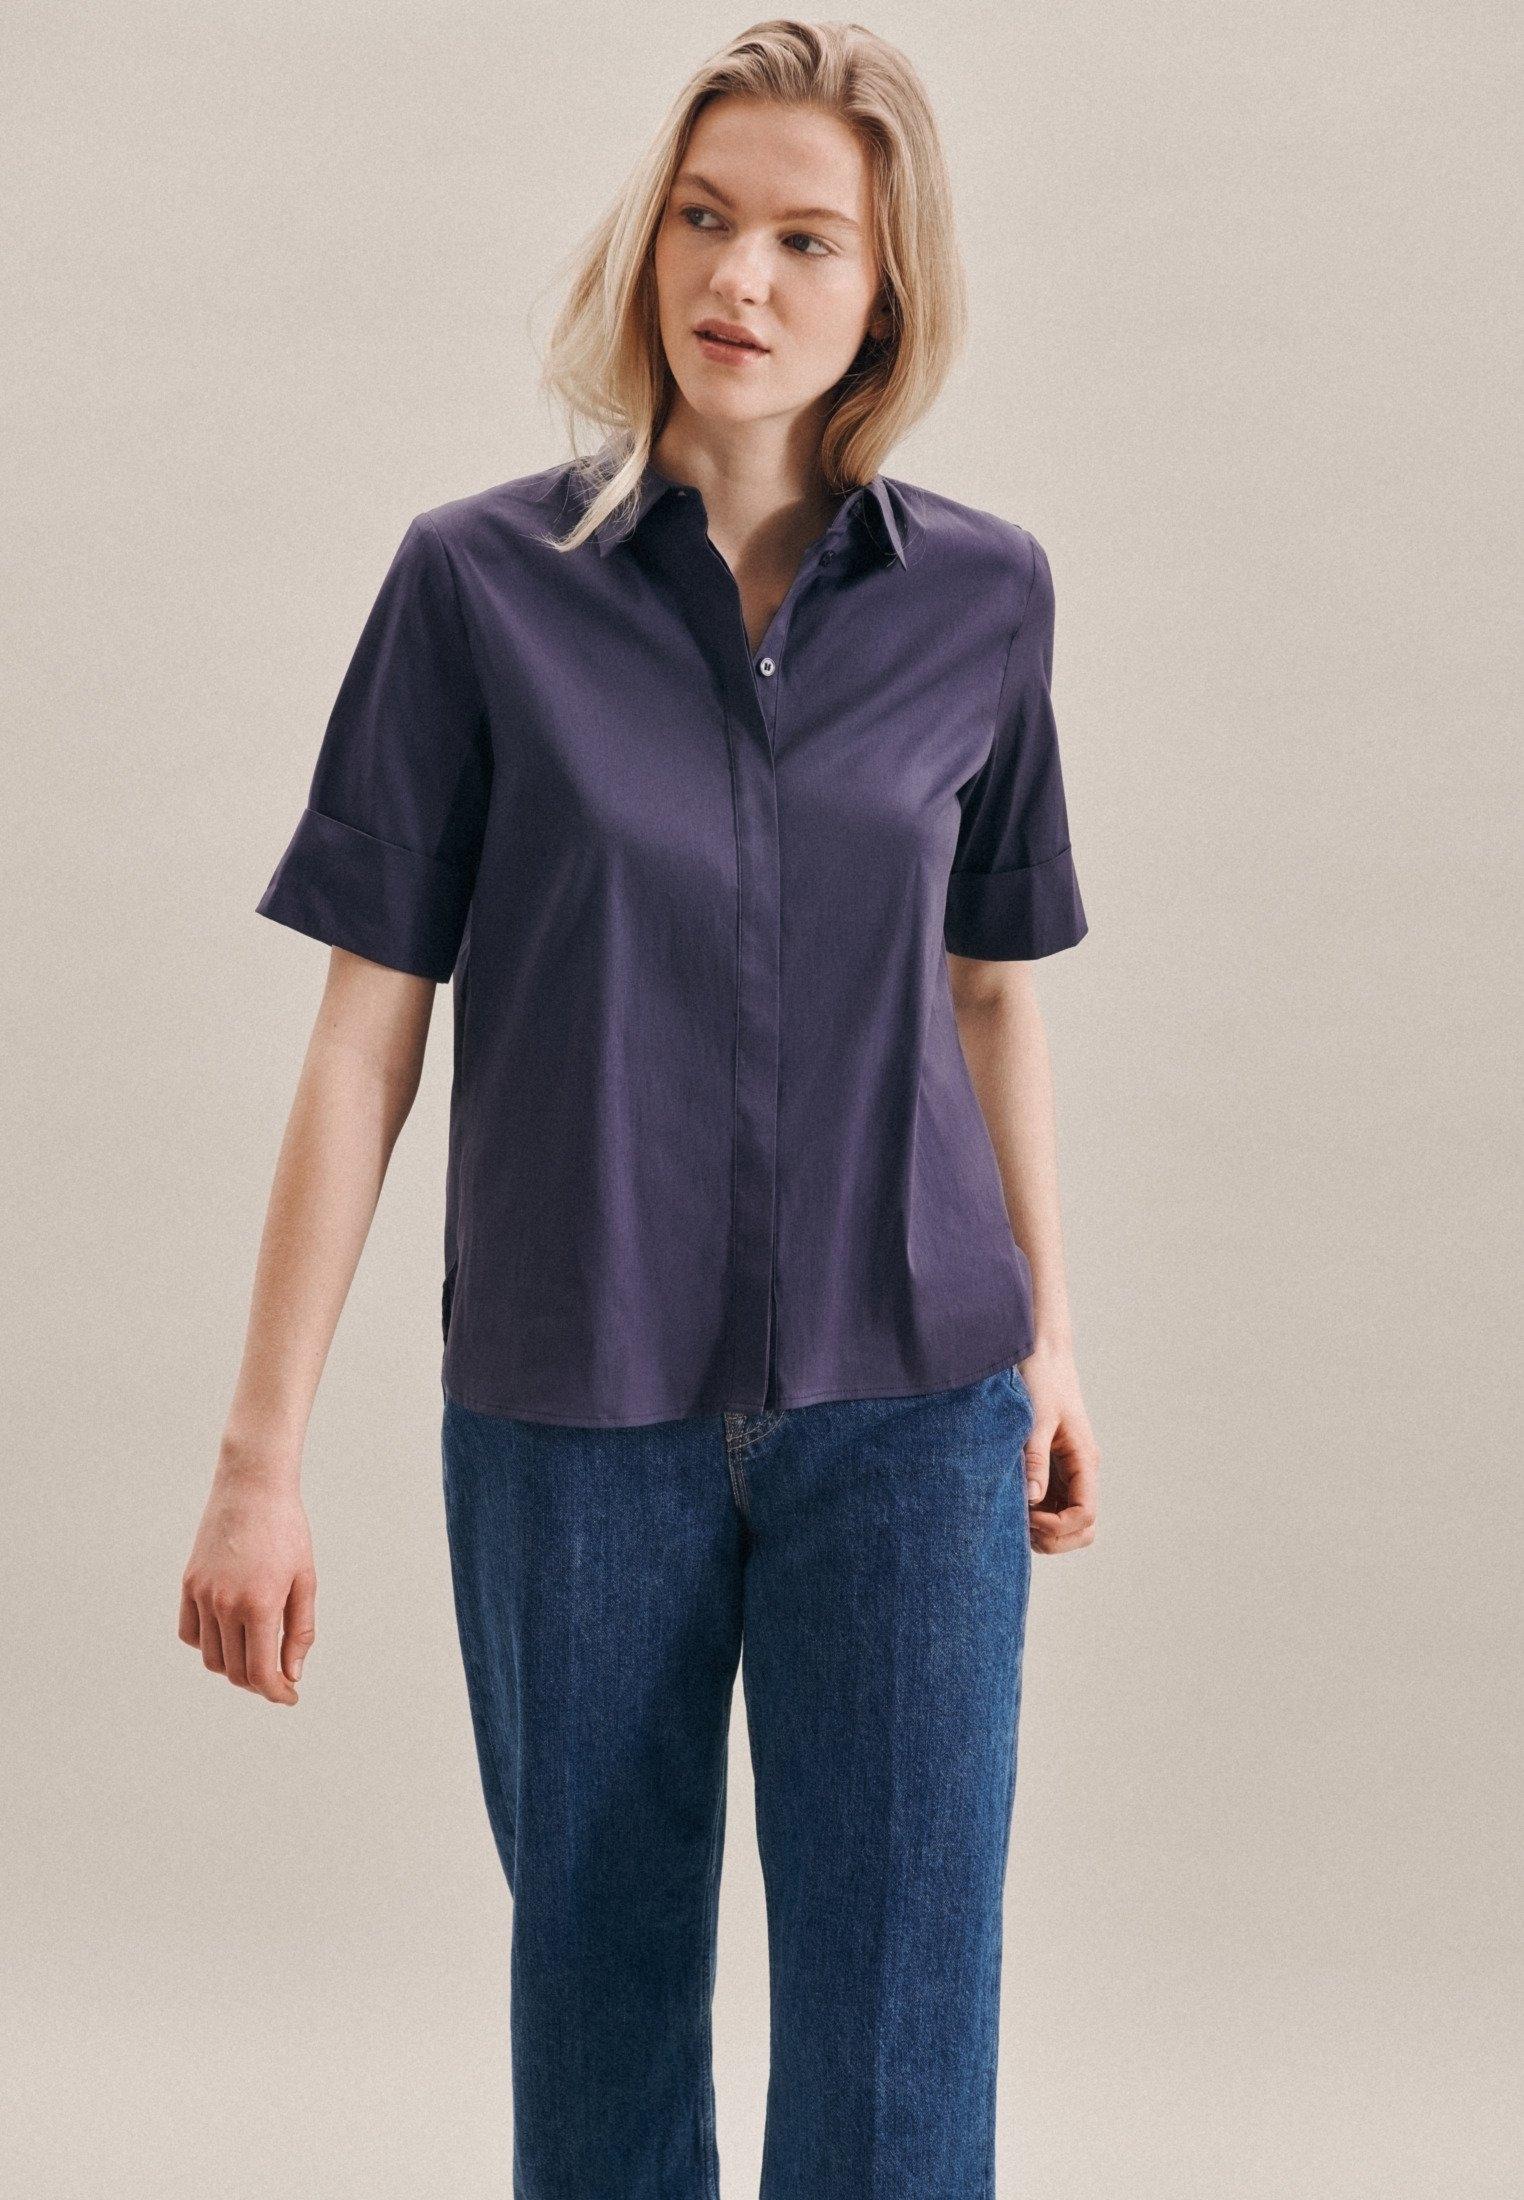 seidensticker overhemdblouse Zwarte roos Korte mouwen kraag uni in de webshop van OTTO kopen